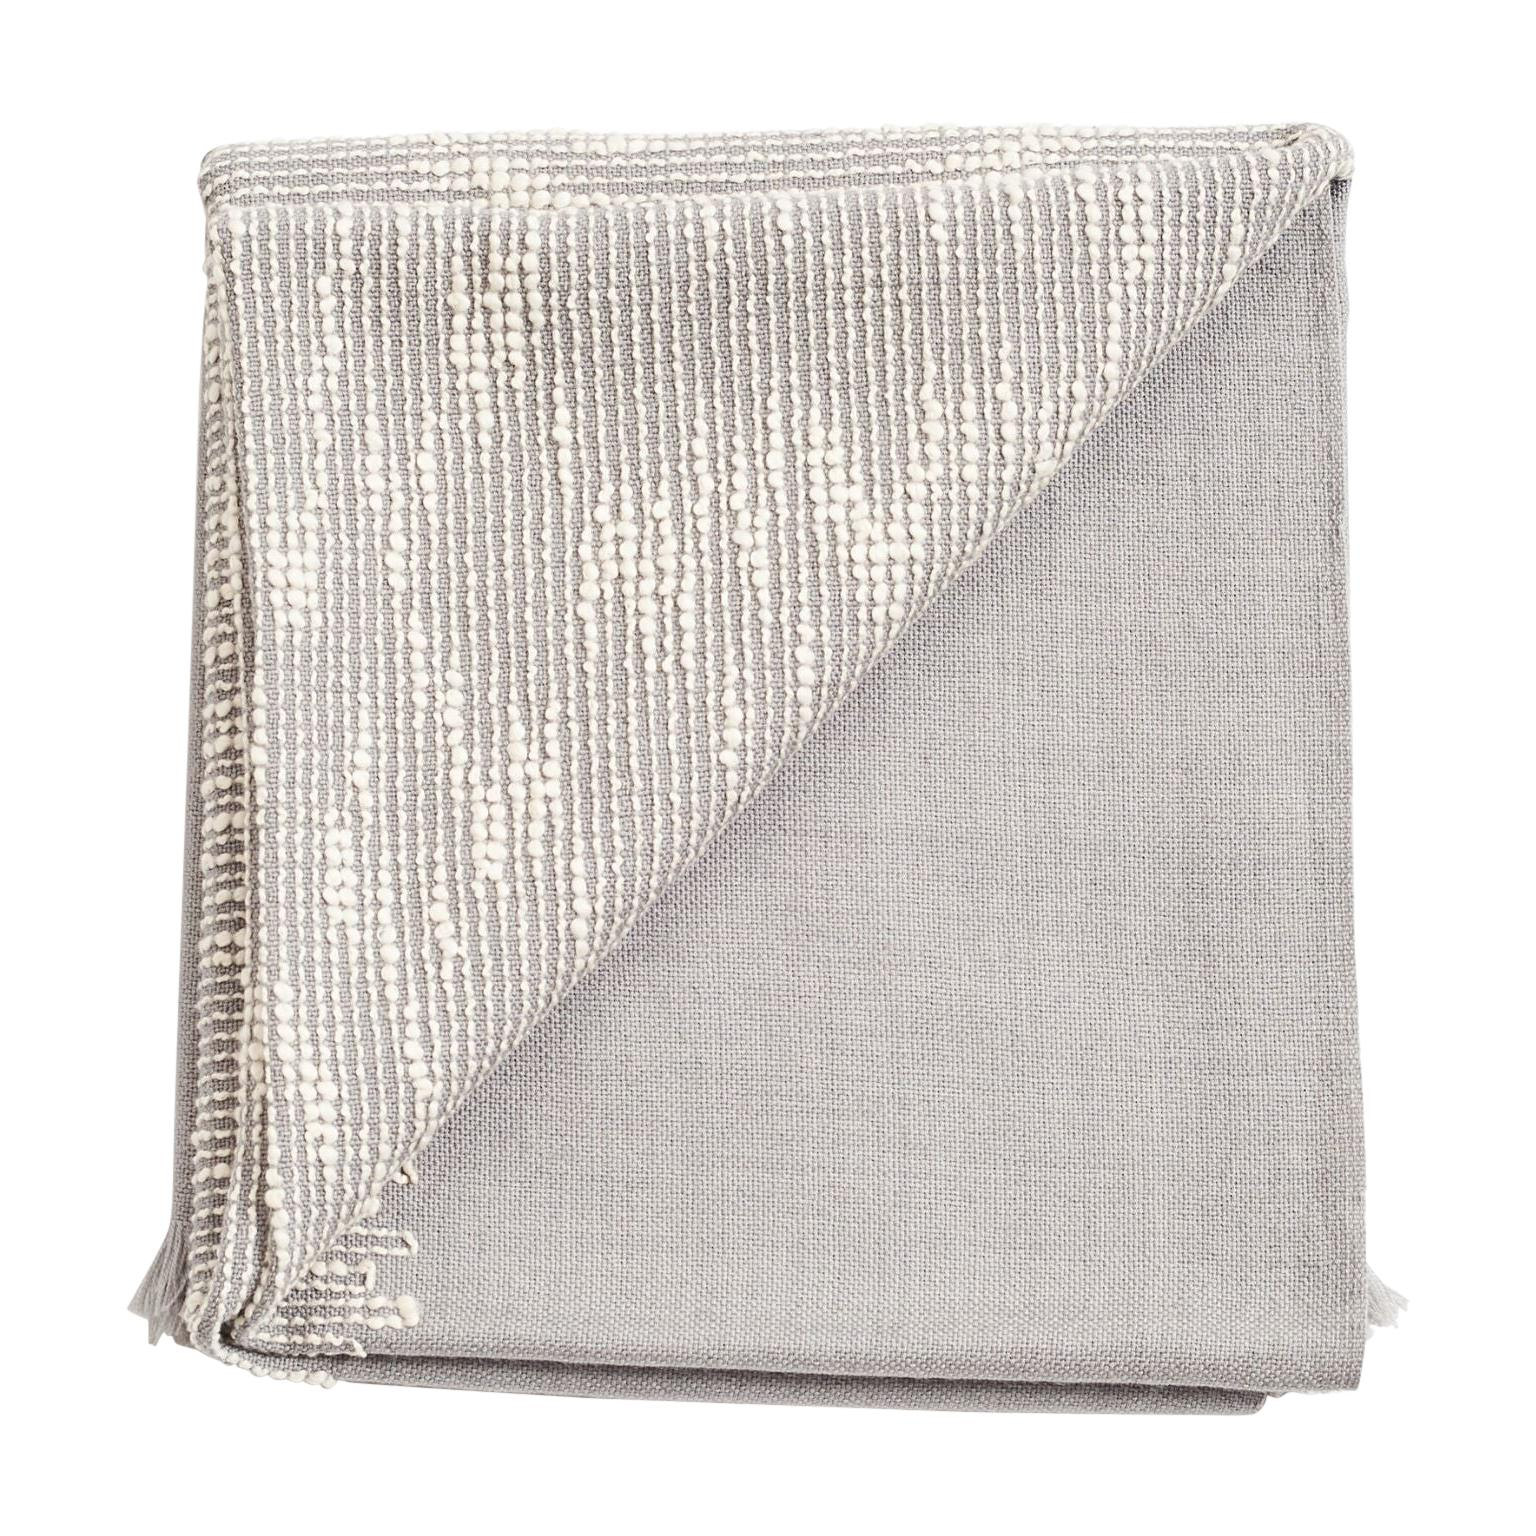 FLO Grey Handloom & Hand Embroidered Throw / Blanket In Merino